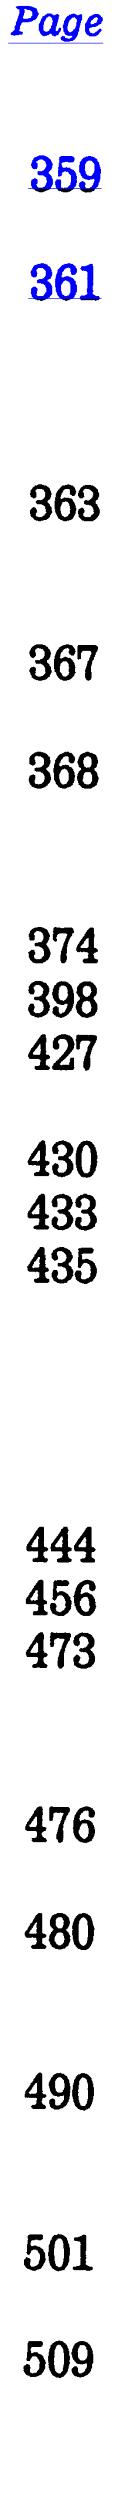 [merged small][ocr errors][ocr errors][ocr errors][merged small][ocr errors][ocr errors][ocr errors][ocr errors][ocr errors]